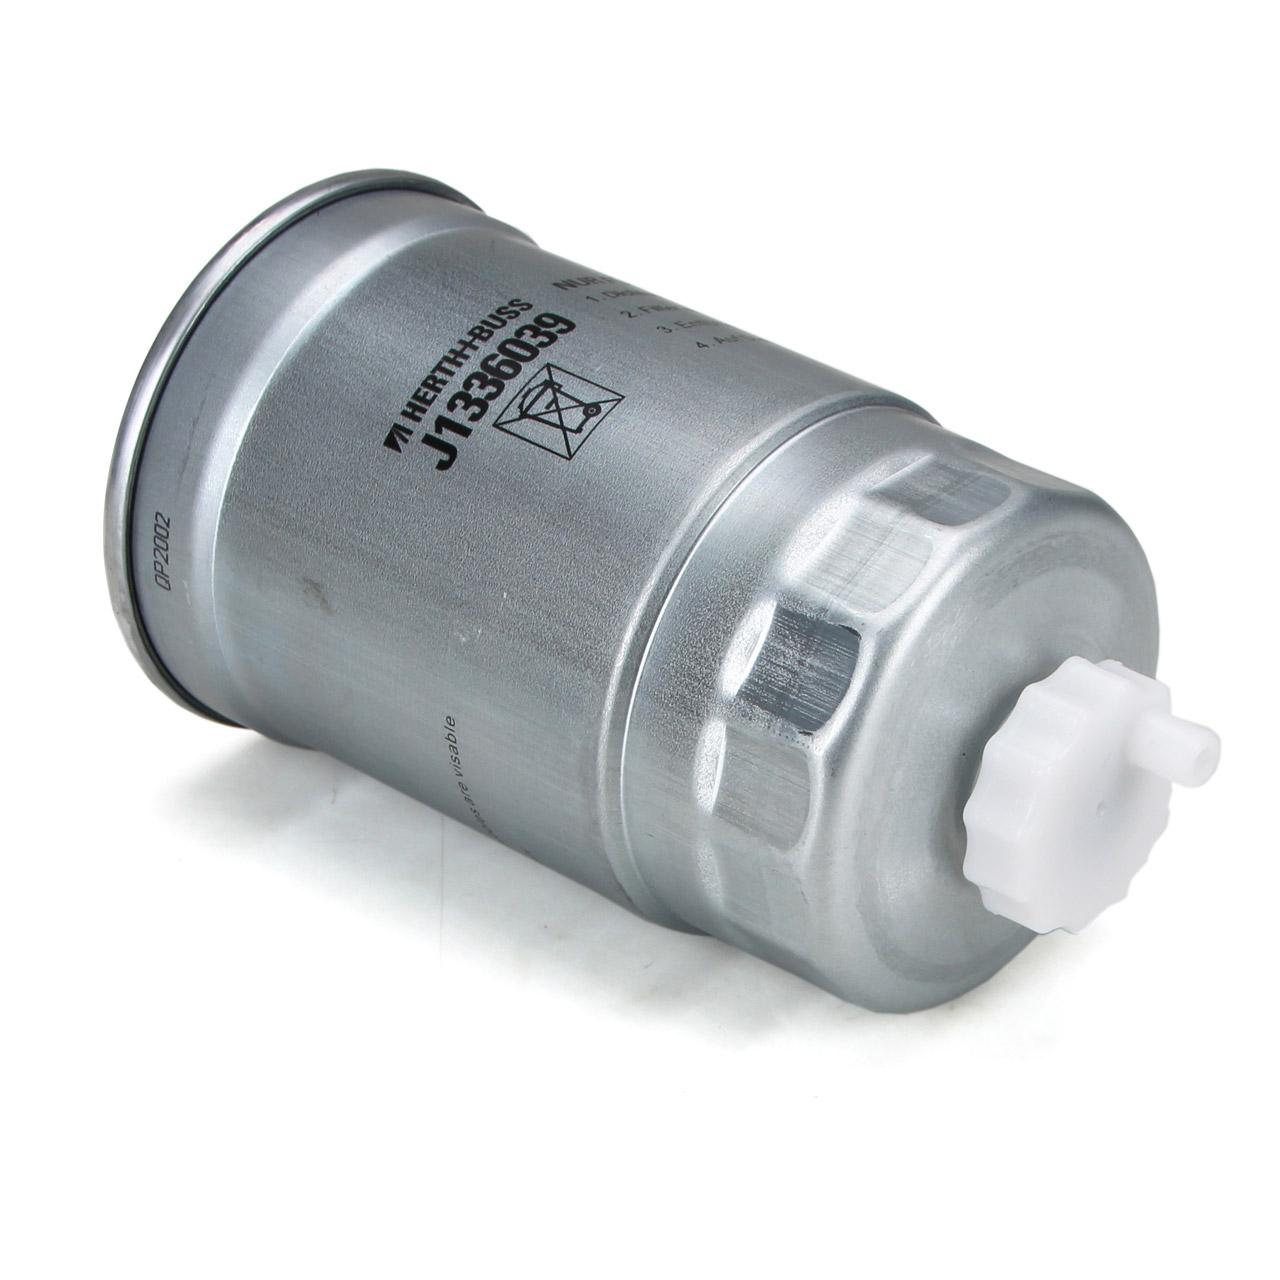 HERTH+BUSS JAKOPARTS Kraftstofffilter Diesel DAIHATSU Hijet 1.2 D 1.4 D